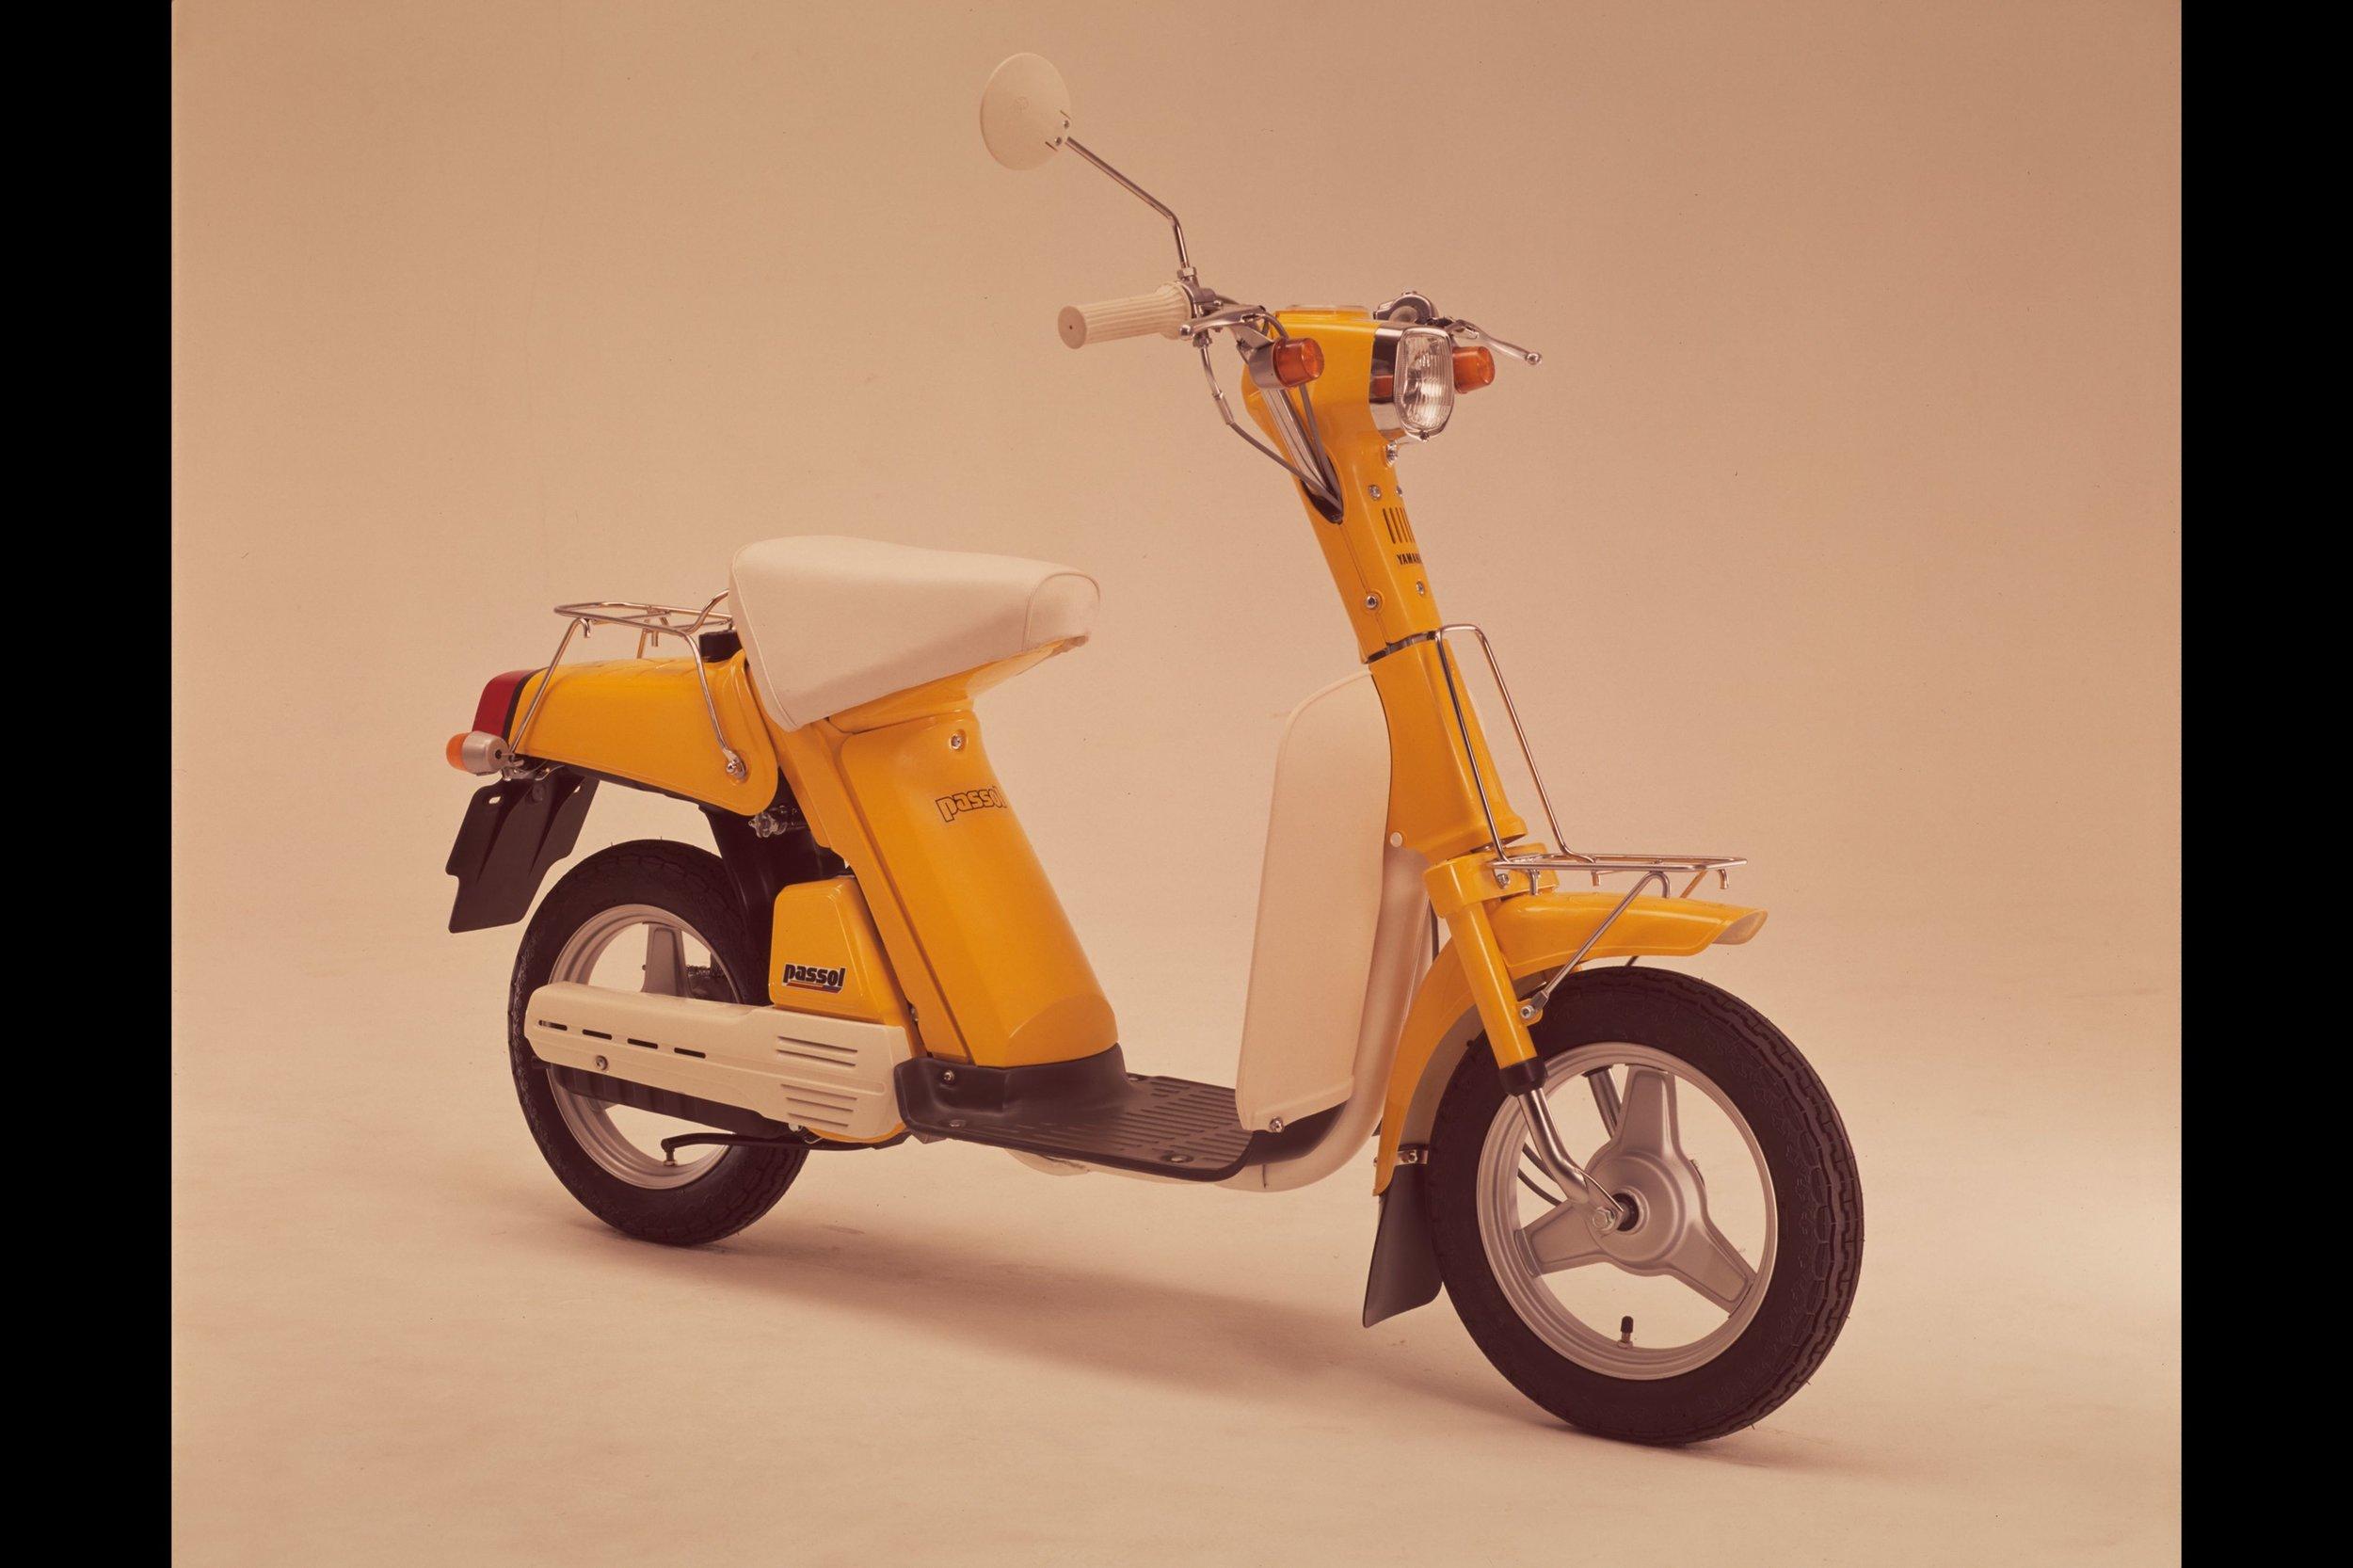 YAMAHA PASSOL S50_請務必載明出處Provided by Yamaha Motor Co., Ltd.jpg